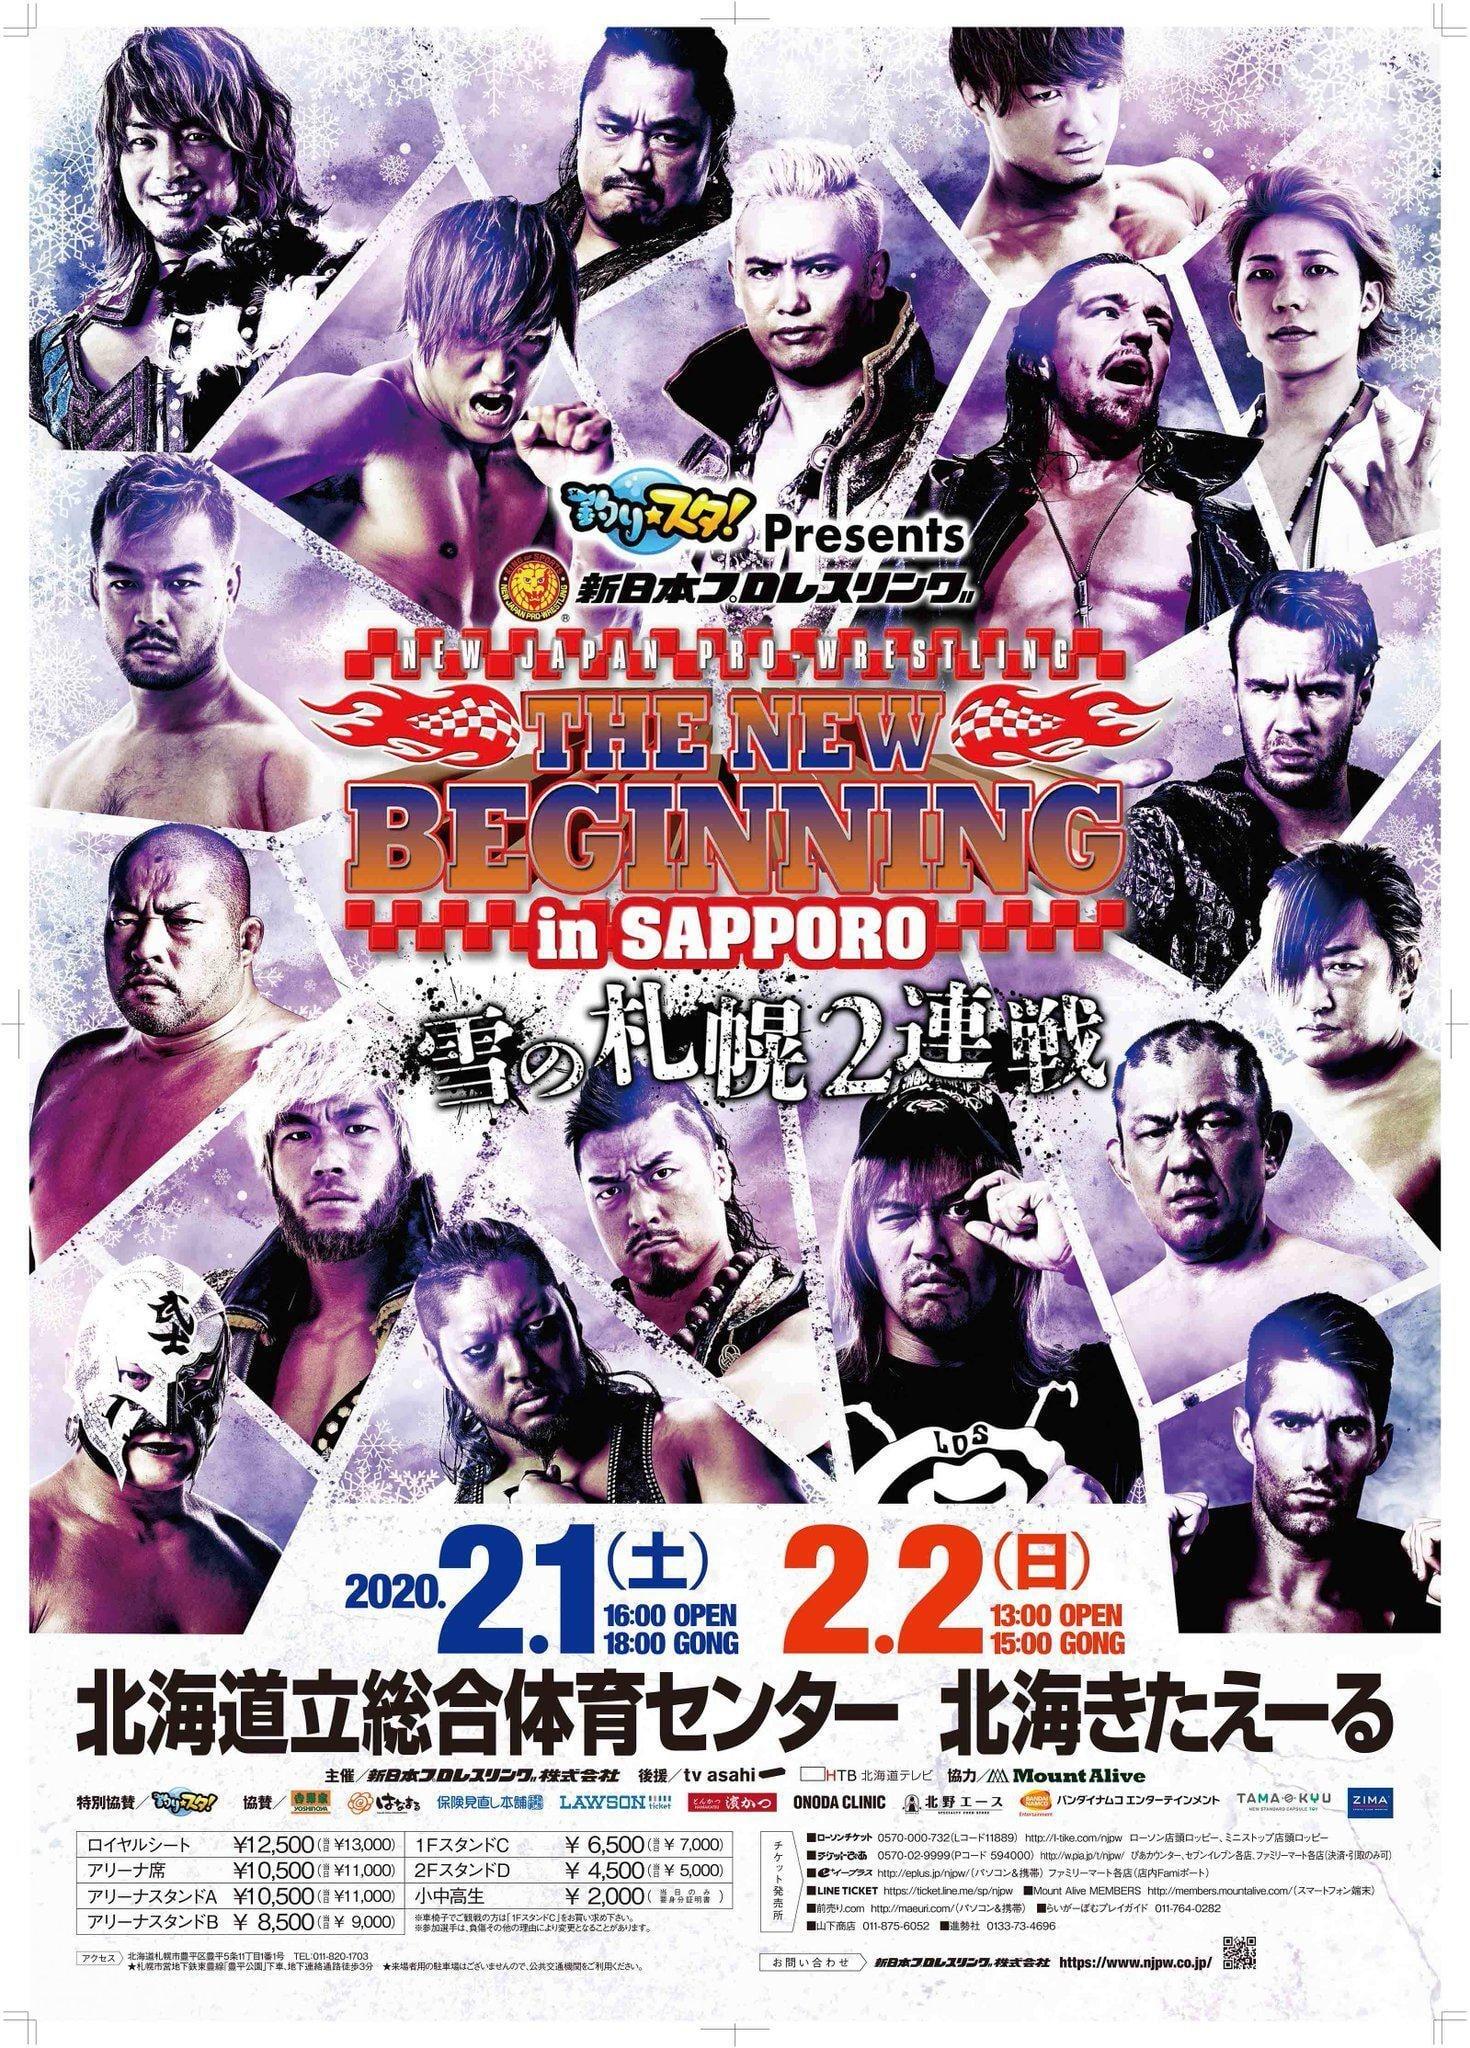 NJPW The New Beginning In Sapporo 2020 - Night 1